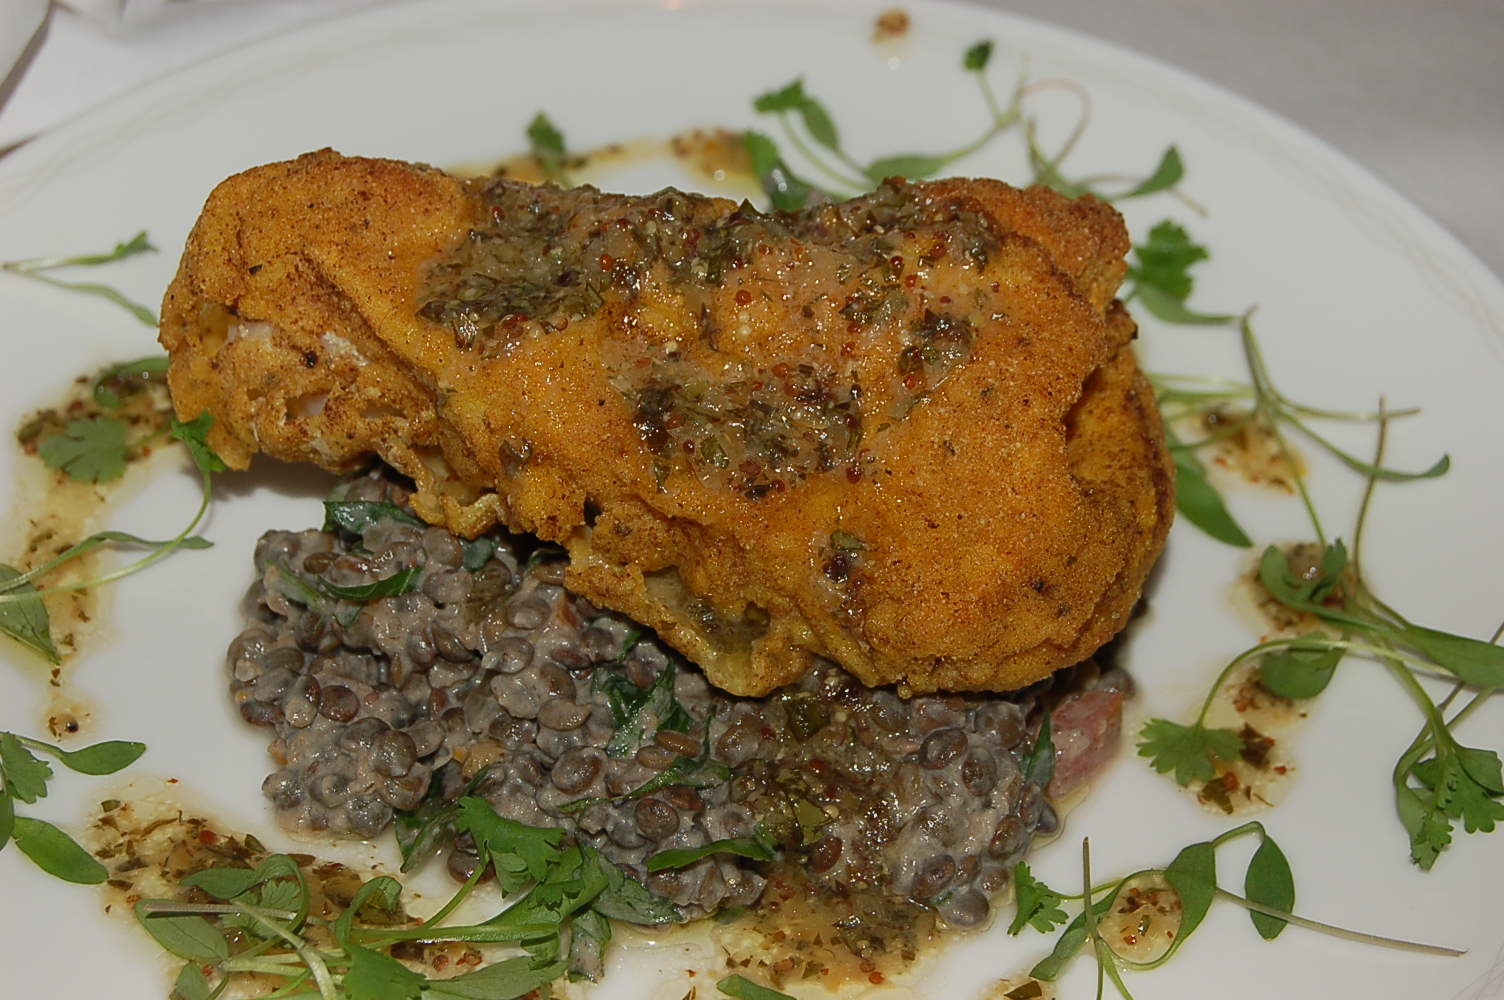 spiced+cornmeal+crusted+monkk+fish.JPG